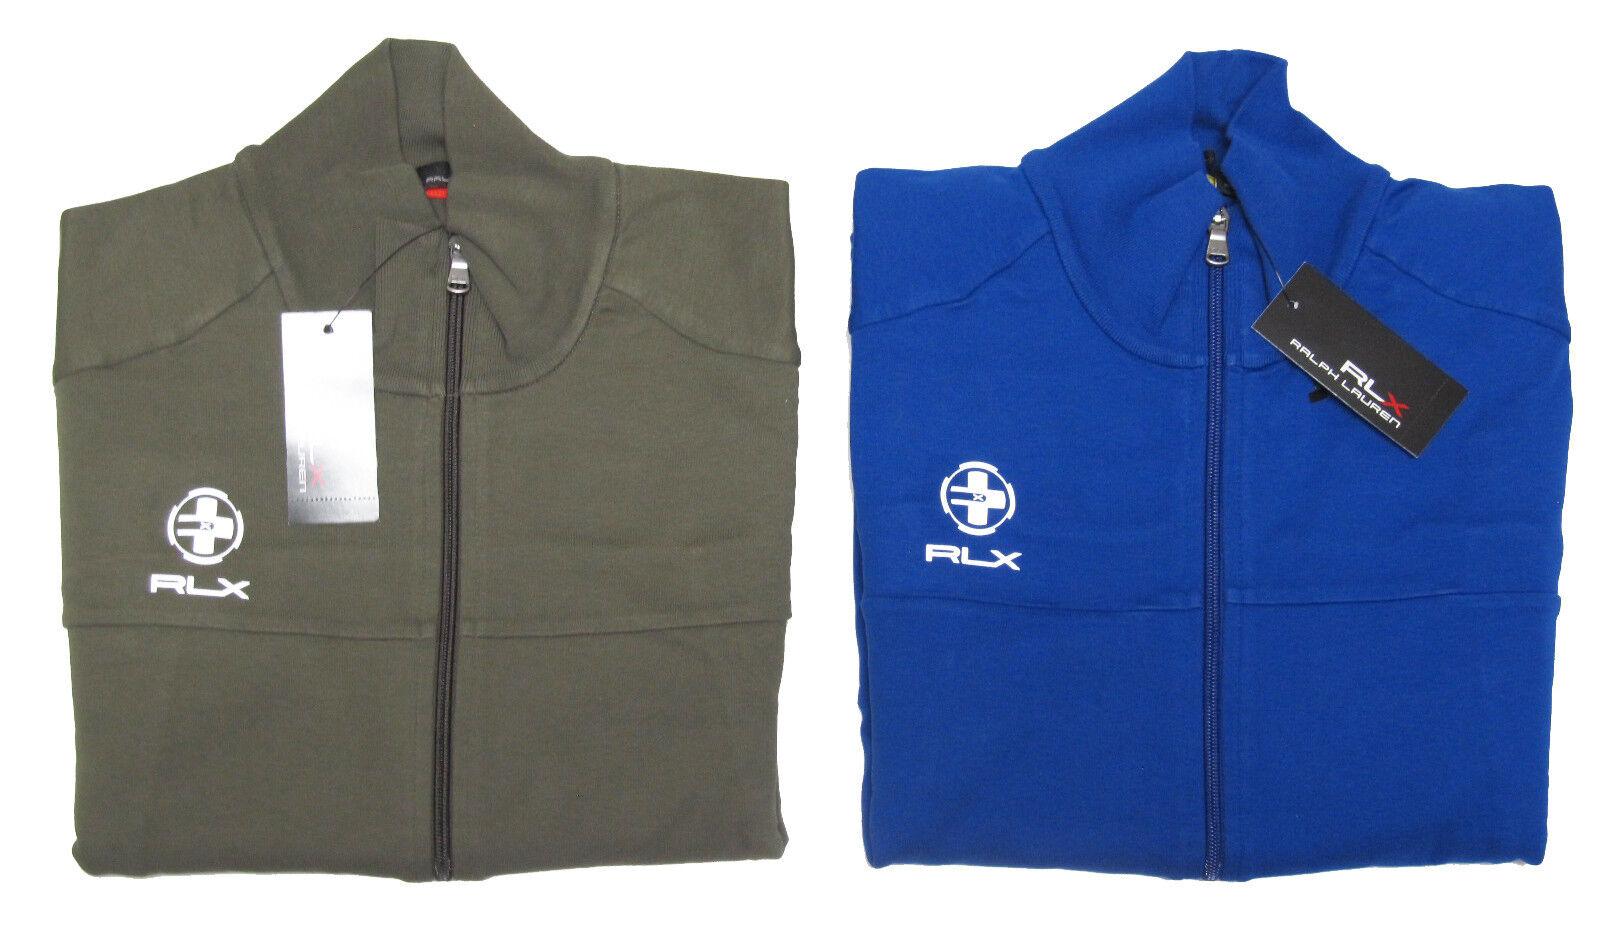 Polo Ralph Lauren RLX Mens Grün Blau Mockneck Track Zip Jersey Jacket Coat New